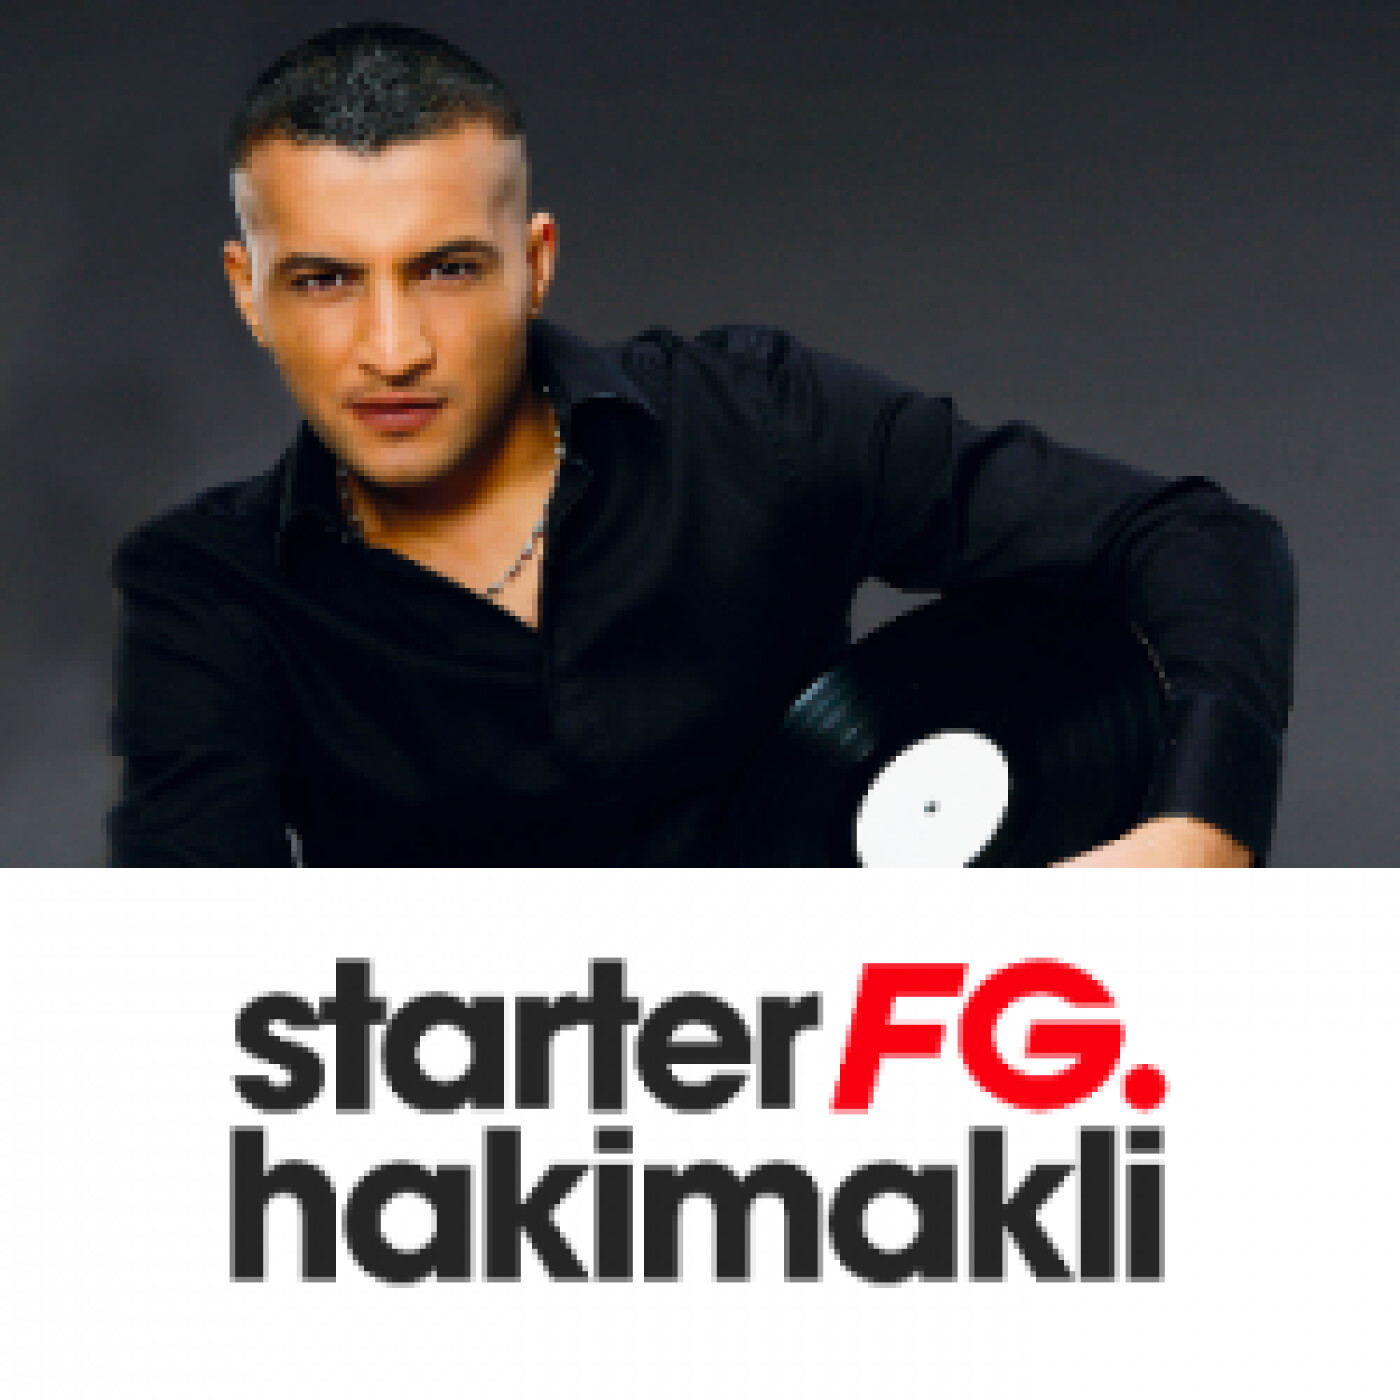 STARTER FG BY HAKIMAKLI MARDI 1er JUIN 2021